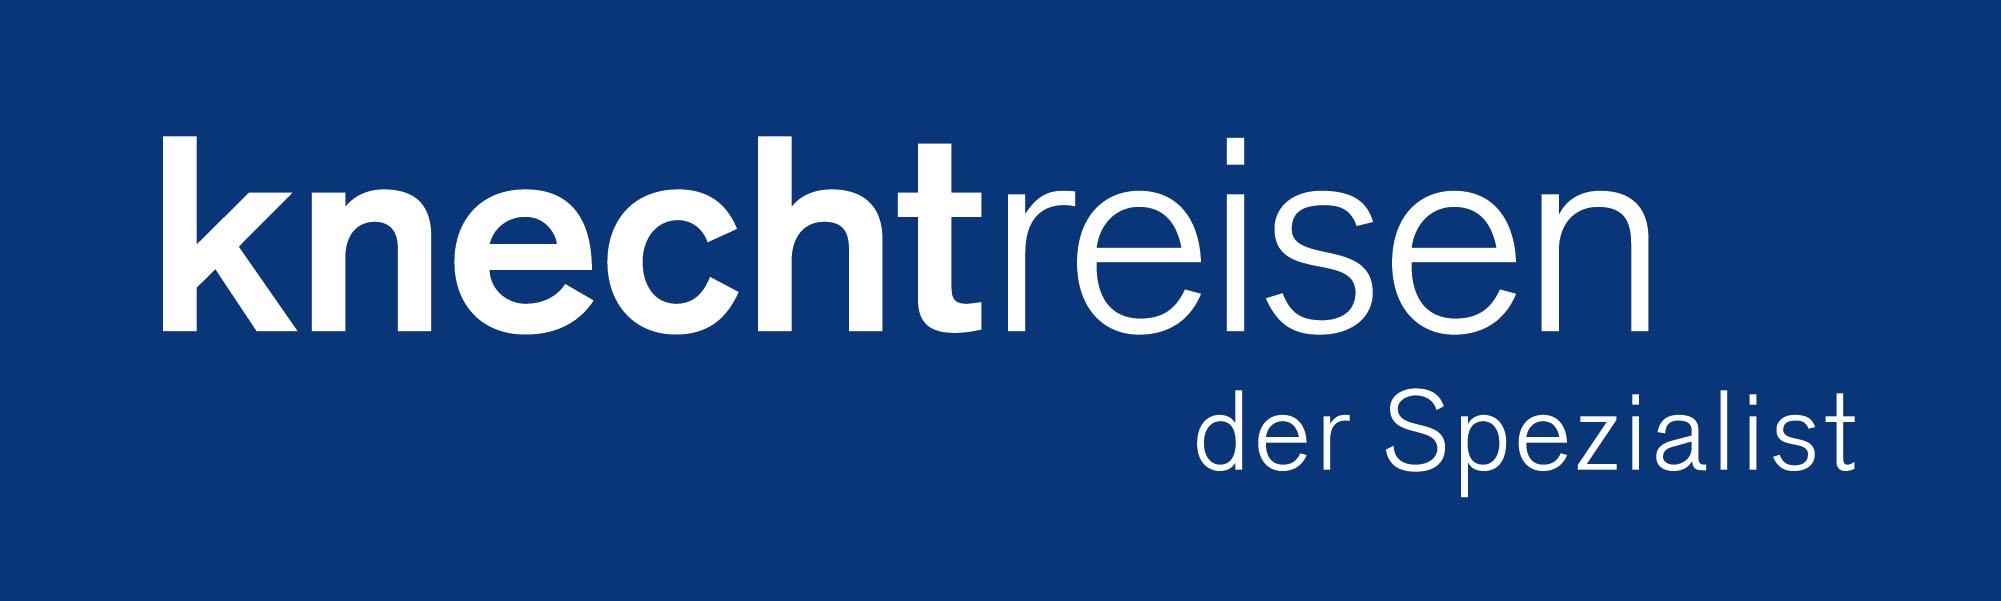 http://kristallclub.ch/wp-content/uploads/2019/09/knechtreisen-logo.jpg